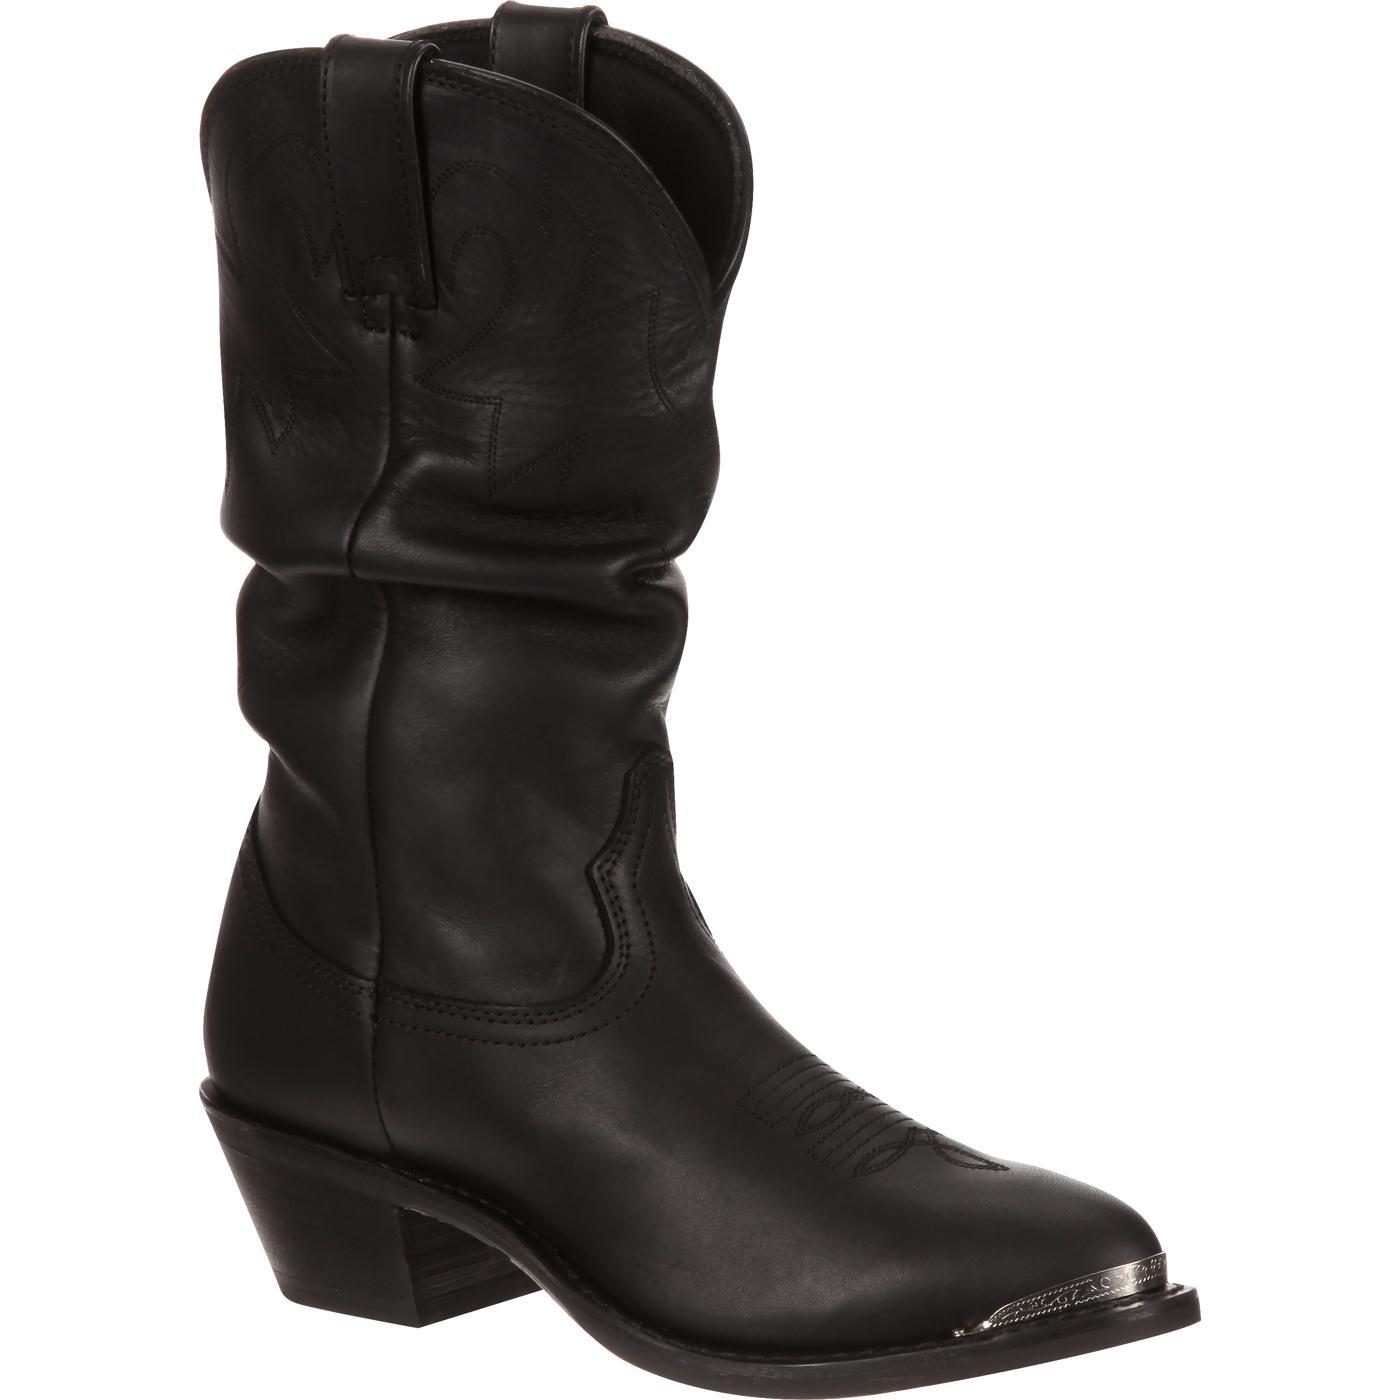 Cowboy womens boots black best photo